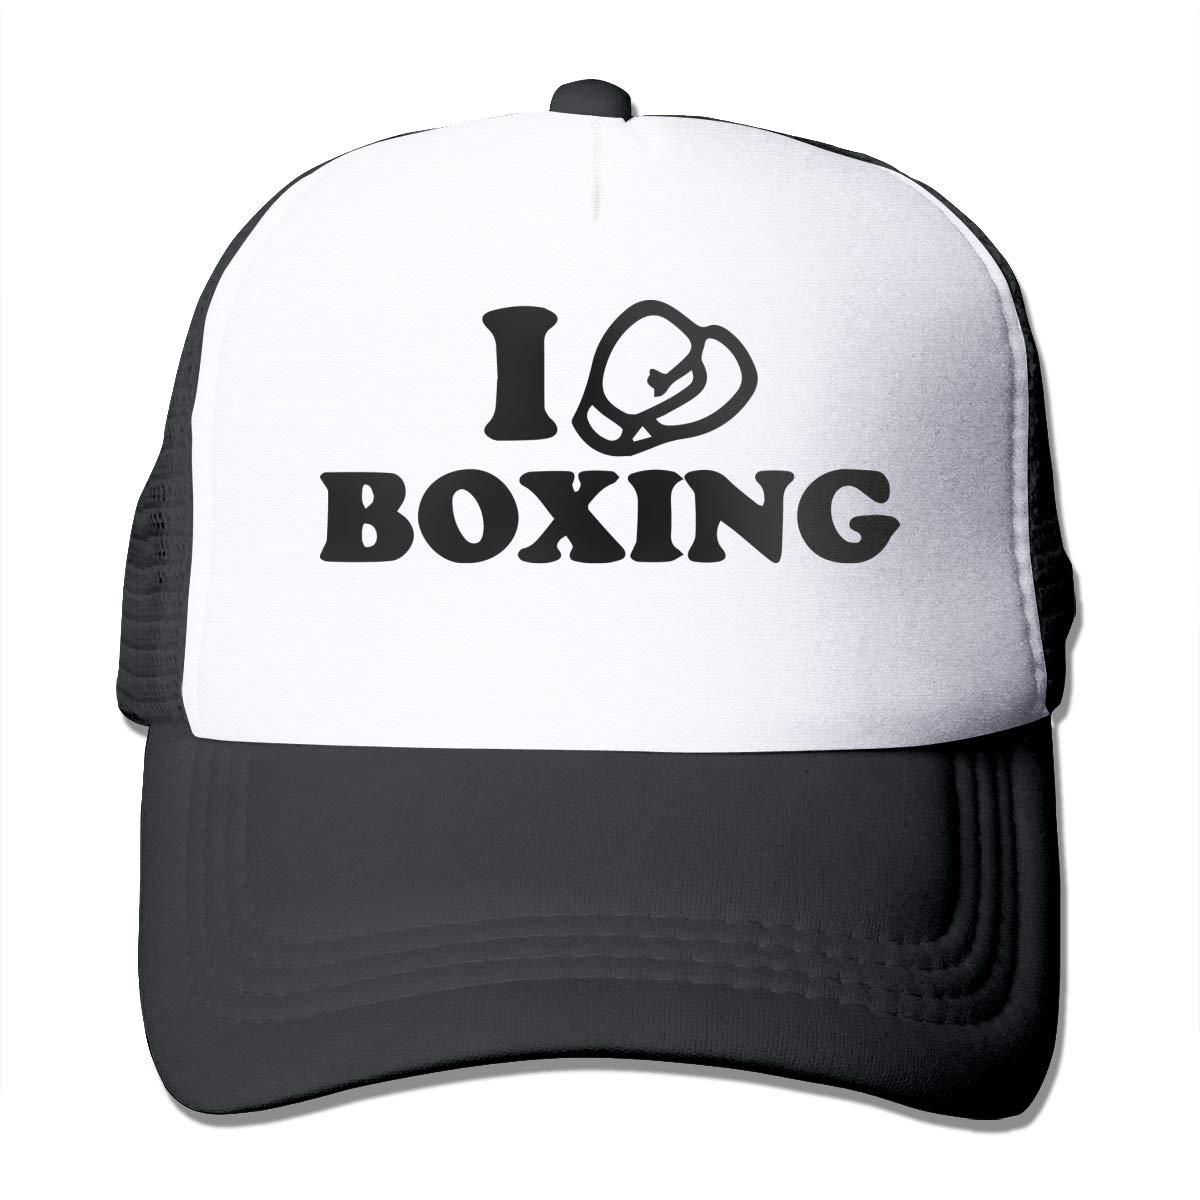 I Love Boxing Trucker Dad-Hat Adjustable Outdoors